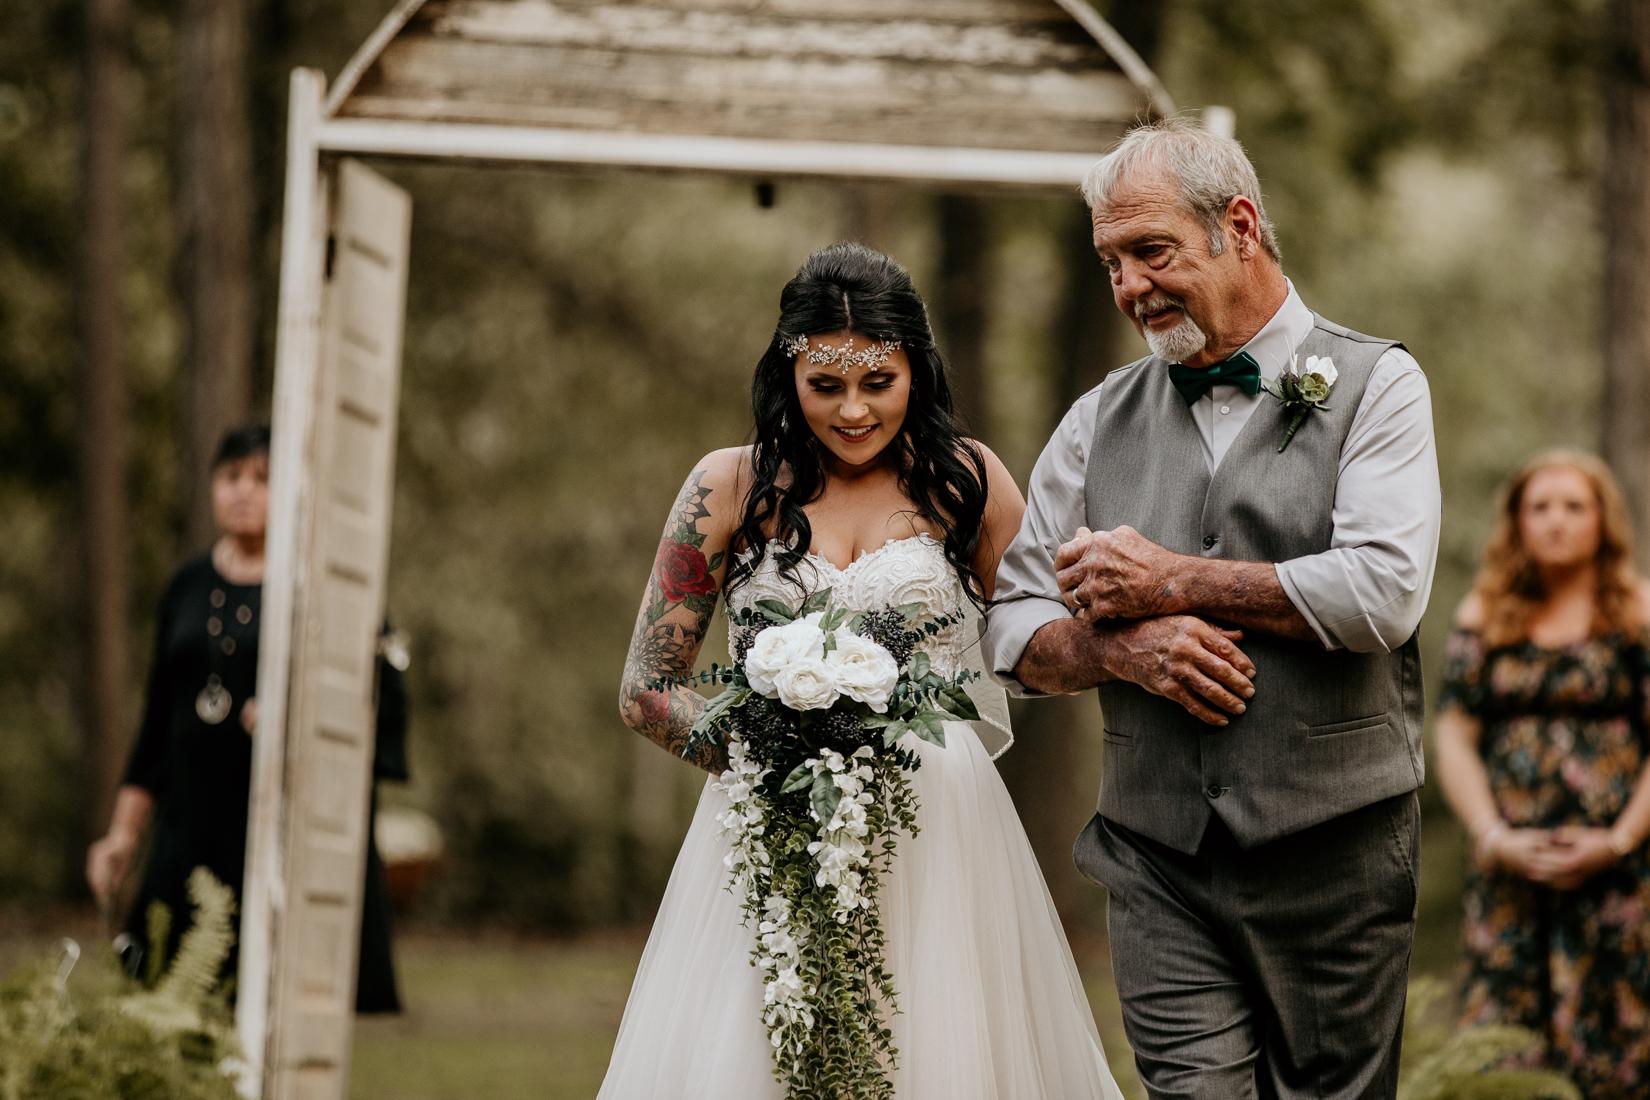 olivia_zay_wedding_09_2018-9612.jpg